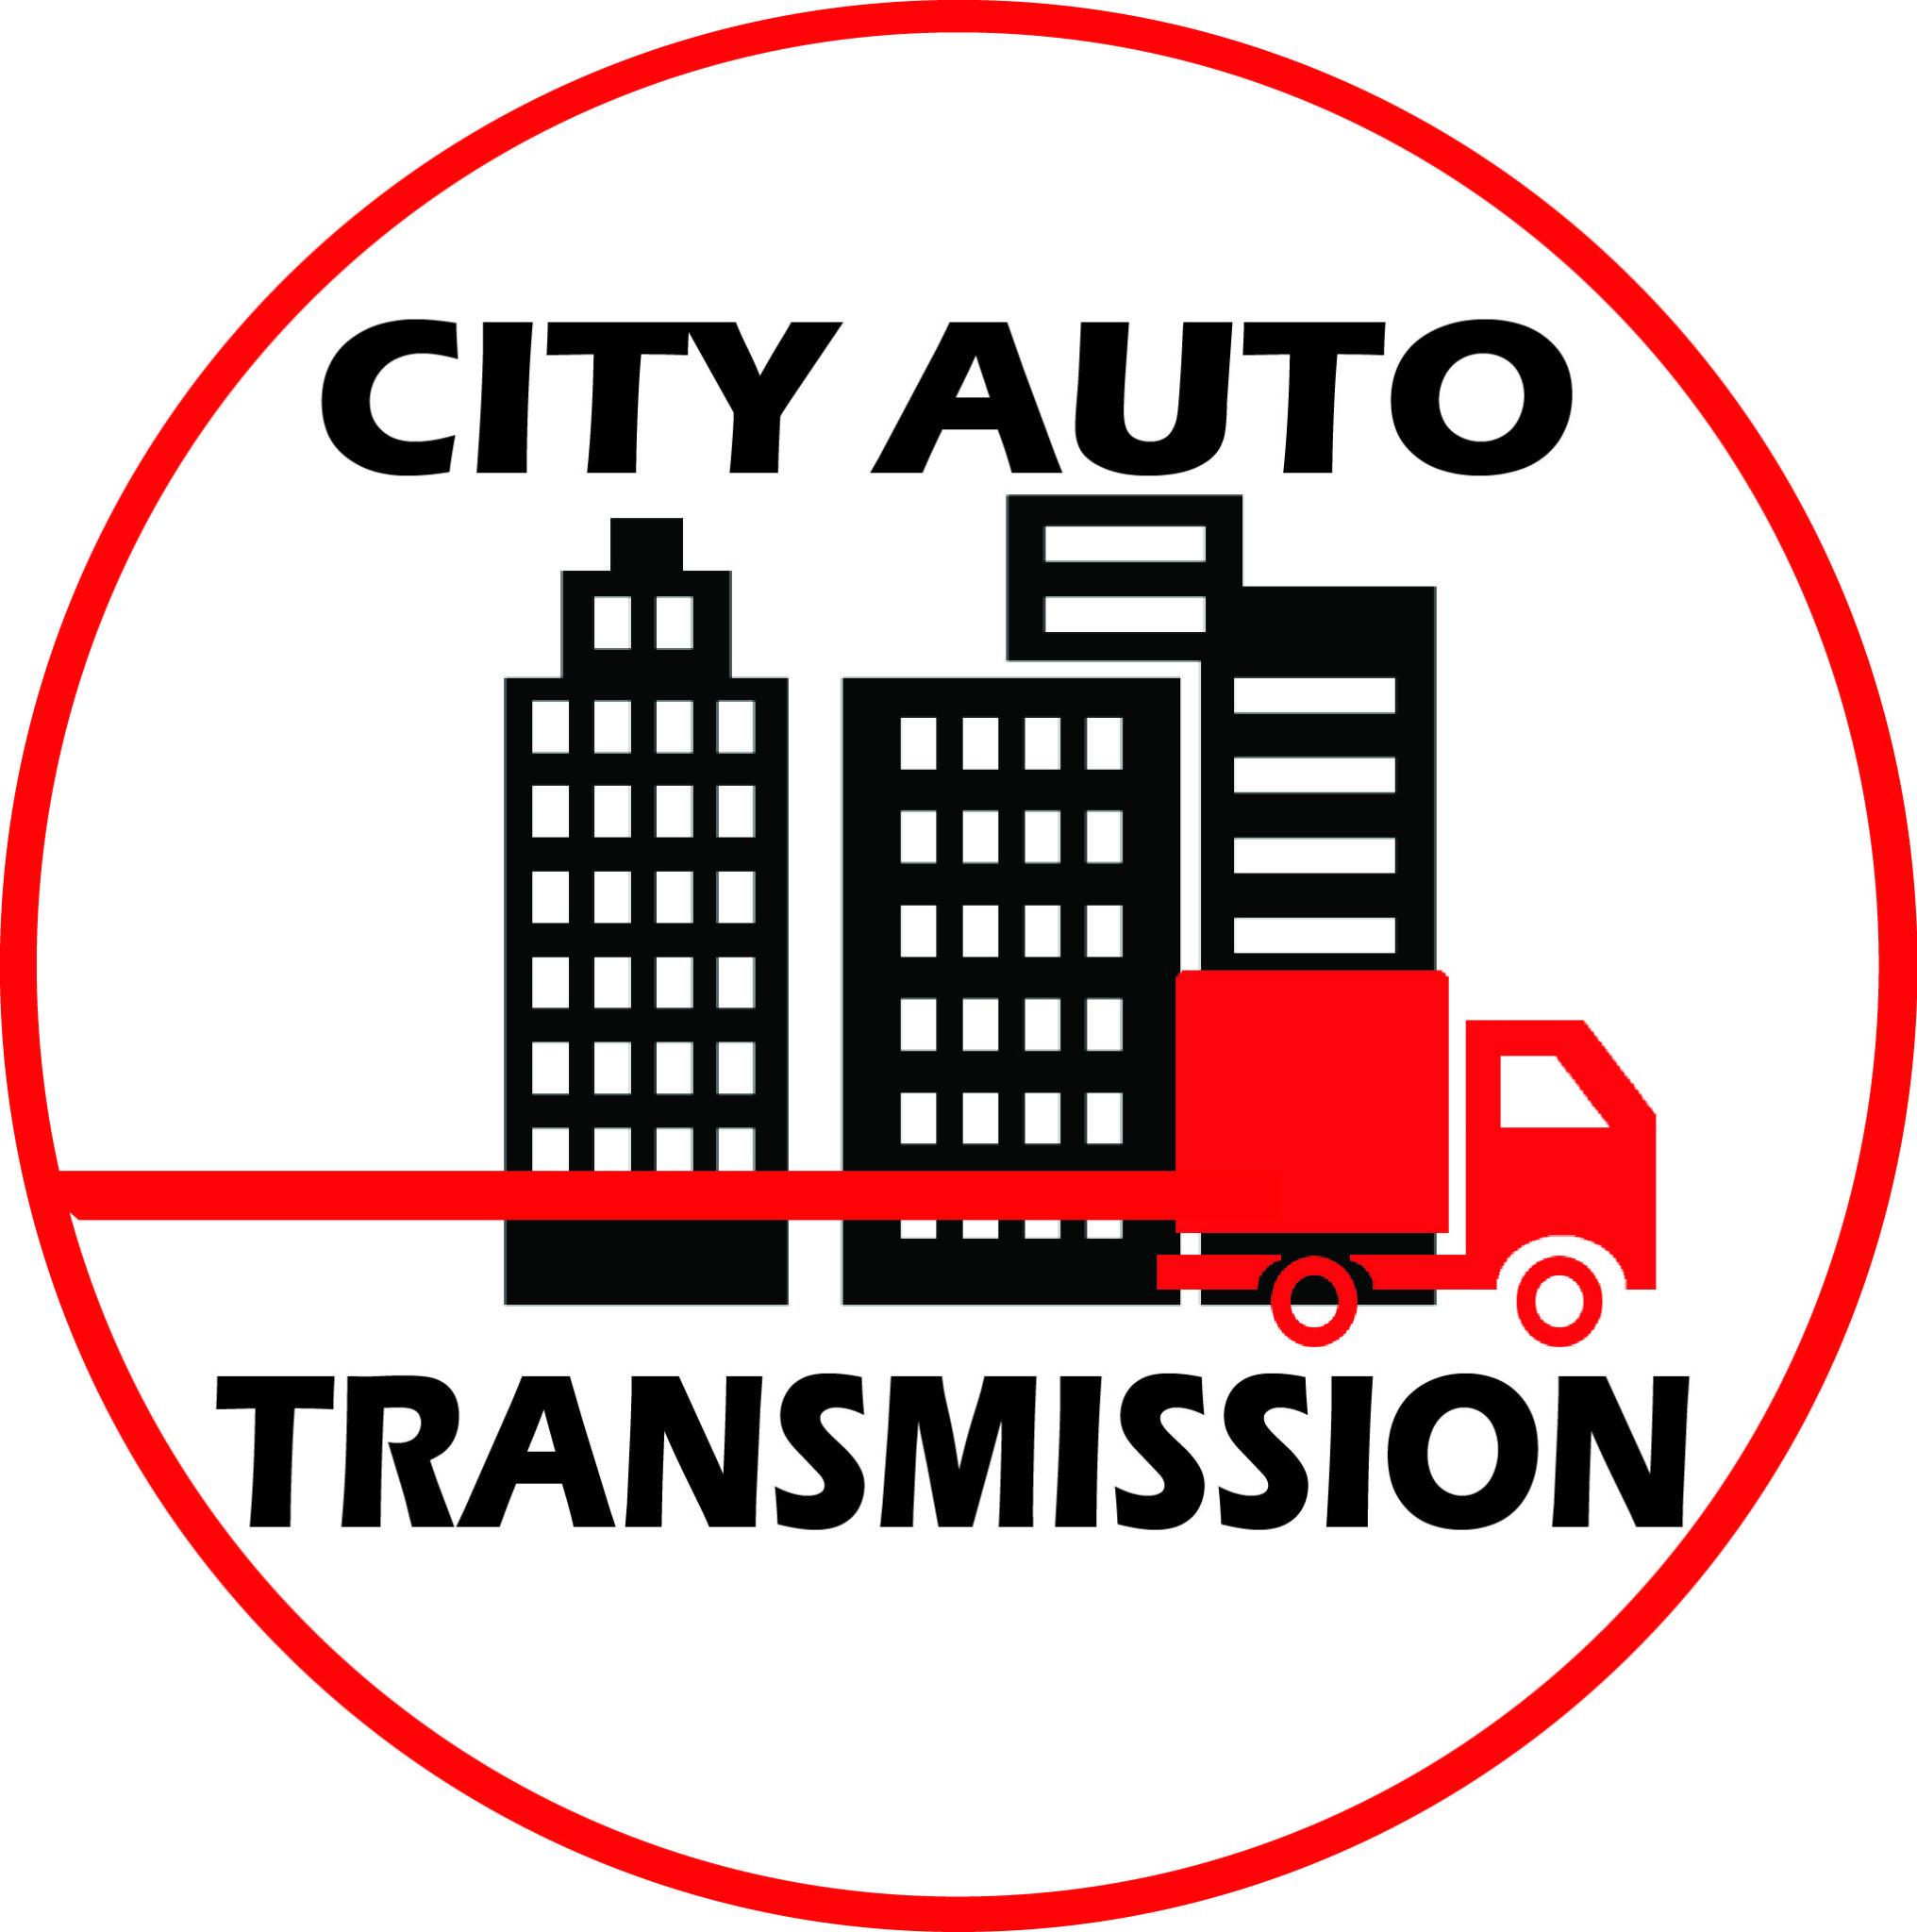 City Auto Transmission